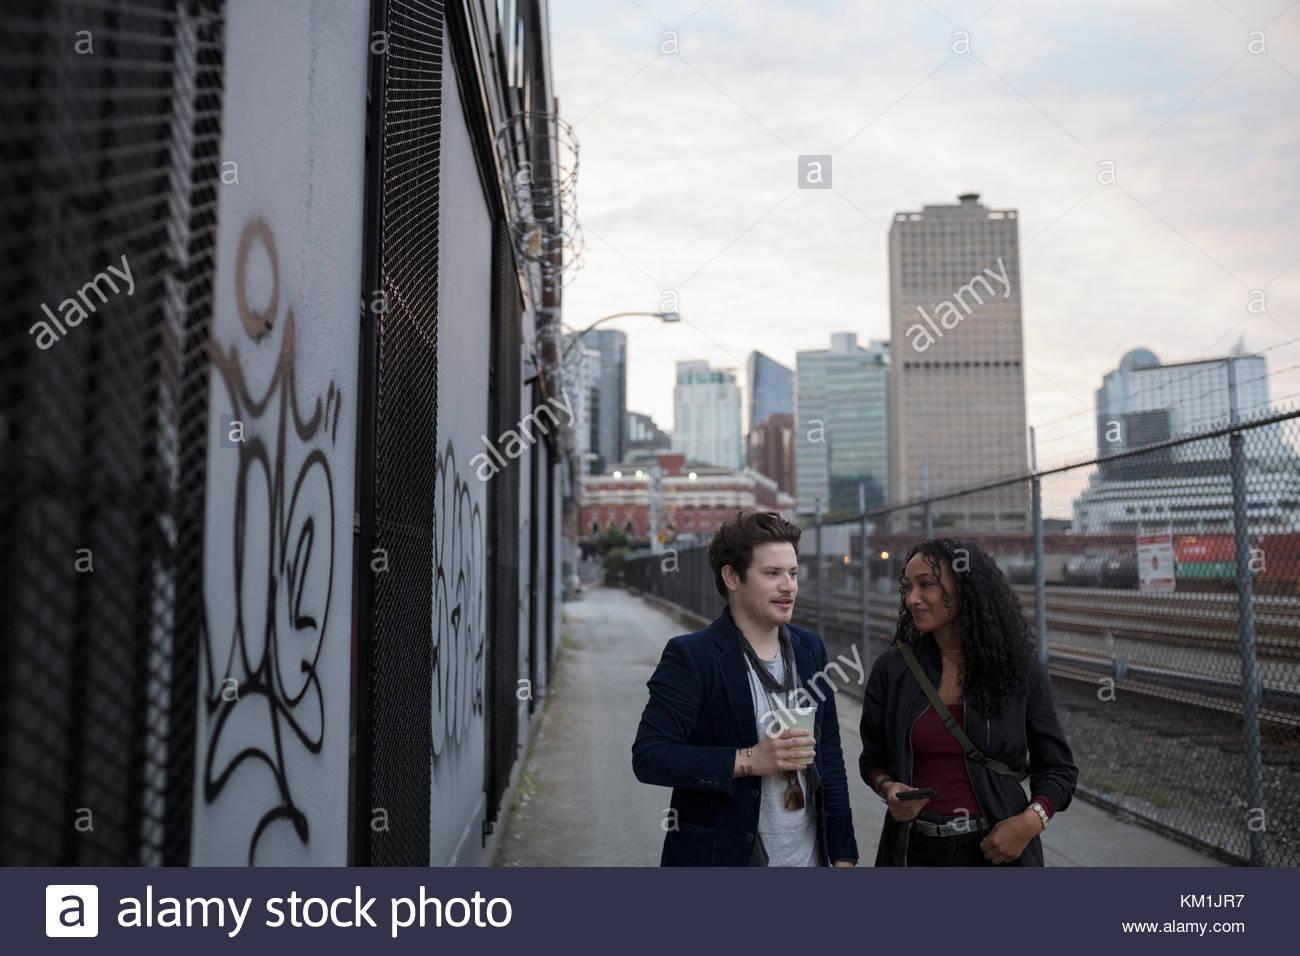 Young couple walking along urban railroad tracks - Stock Image